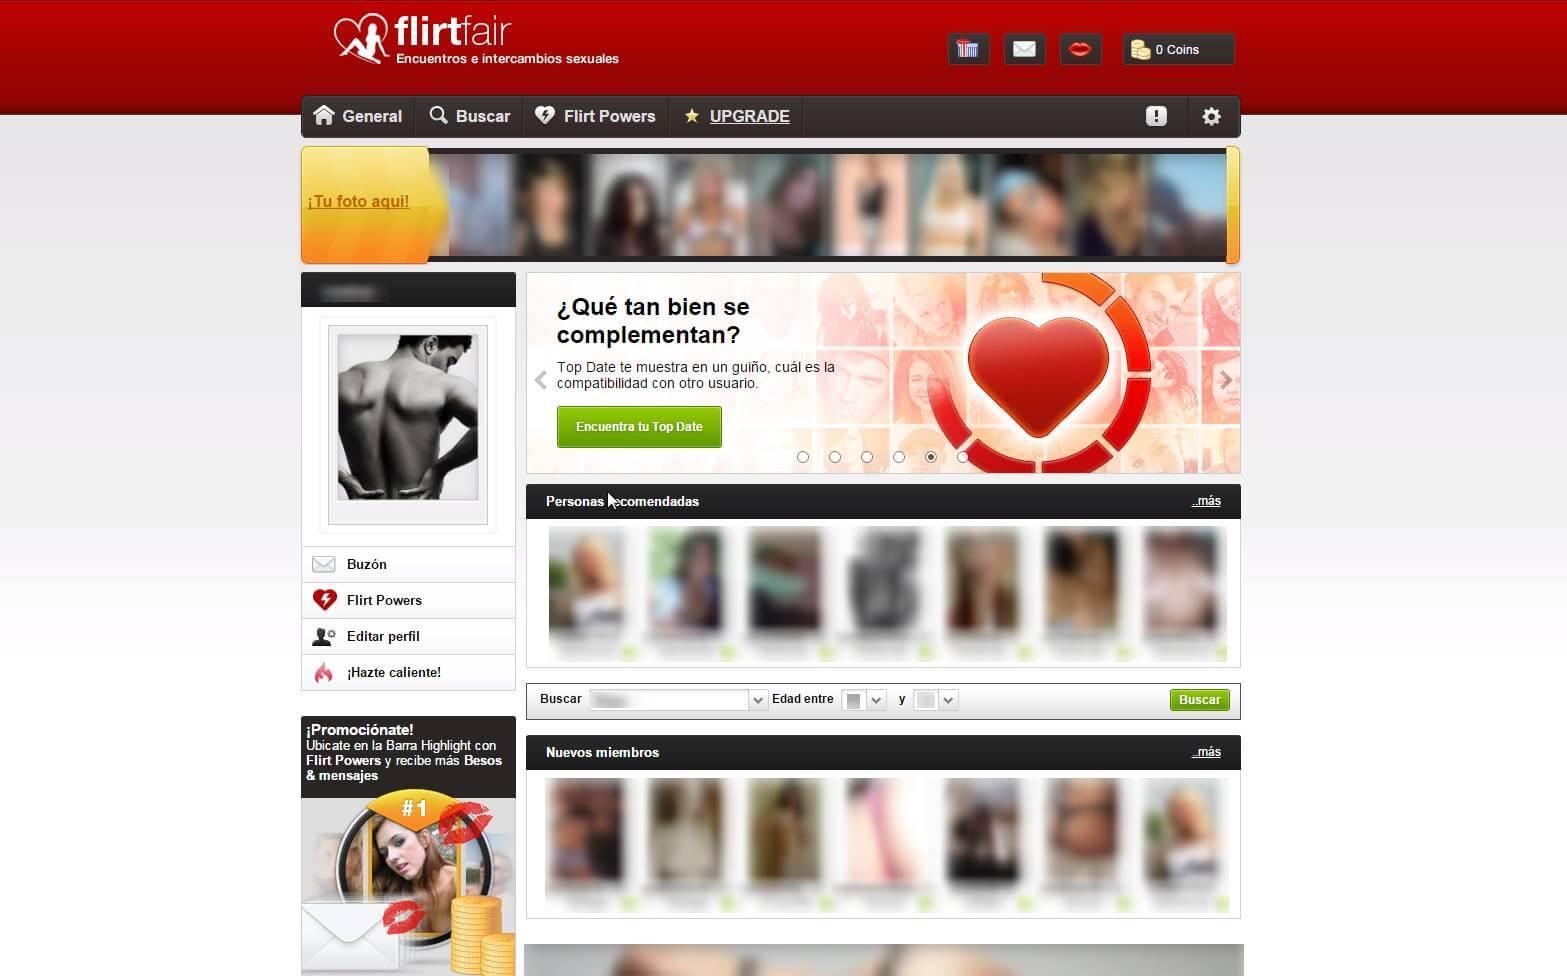 Perfil en FlirtFair